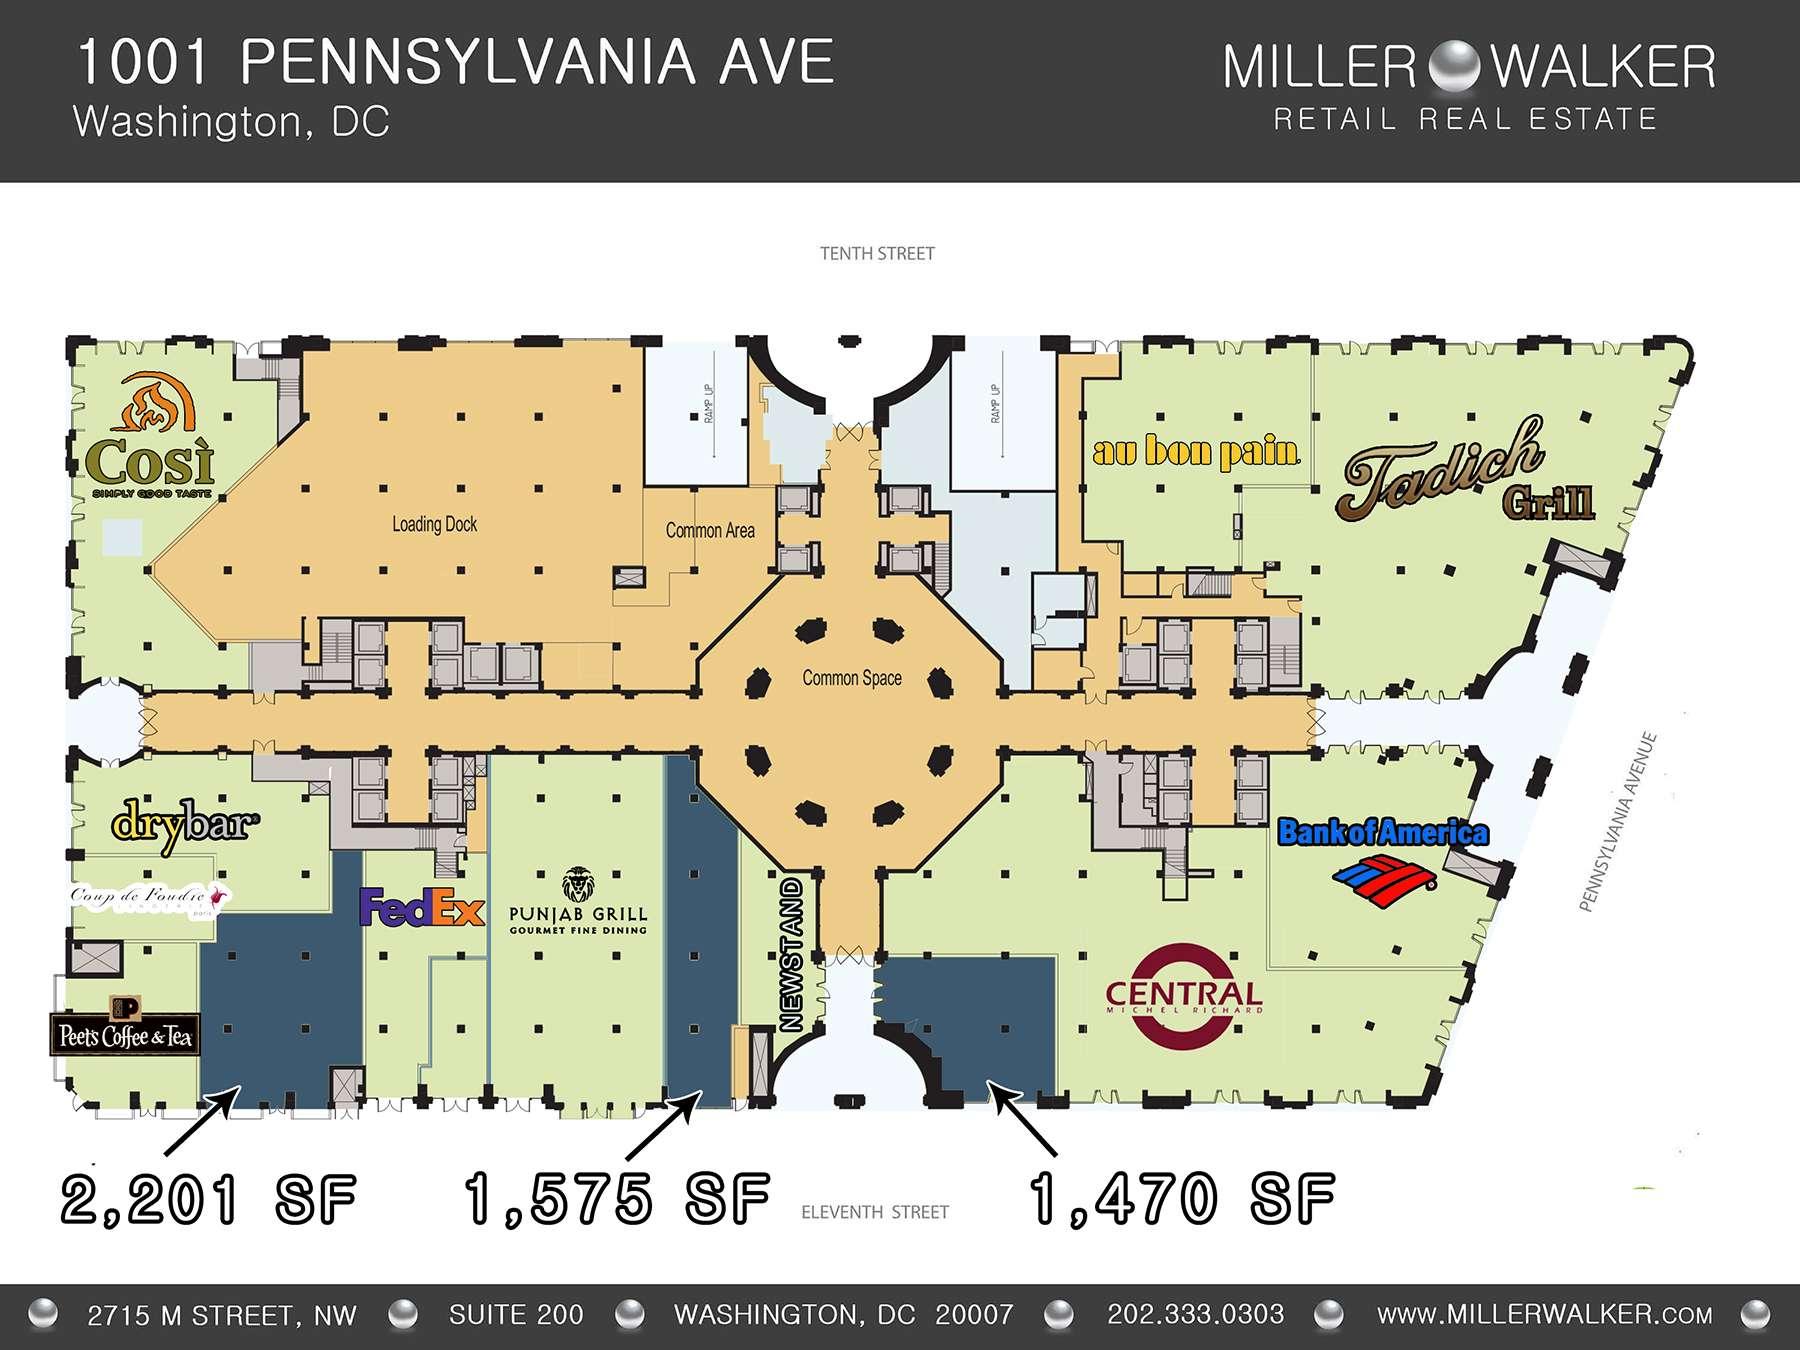 1001-pennsylvania-avenue-site-plan-4-28-2017